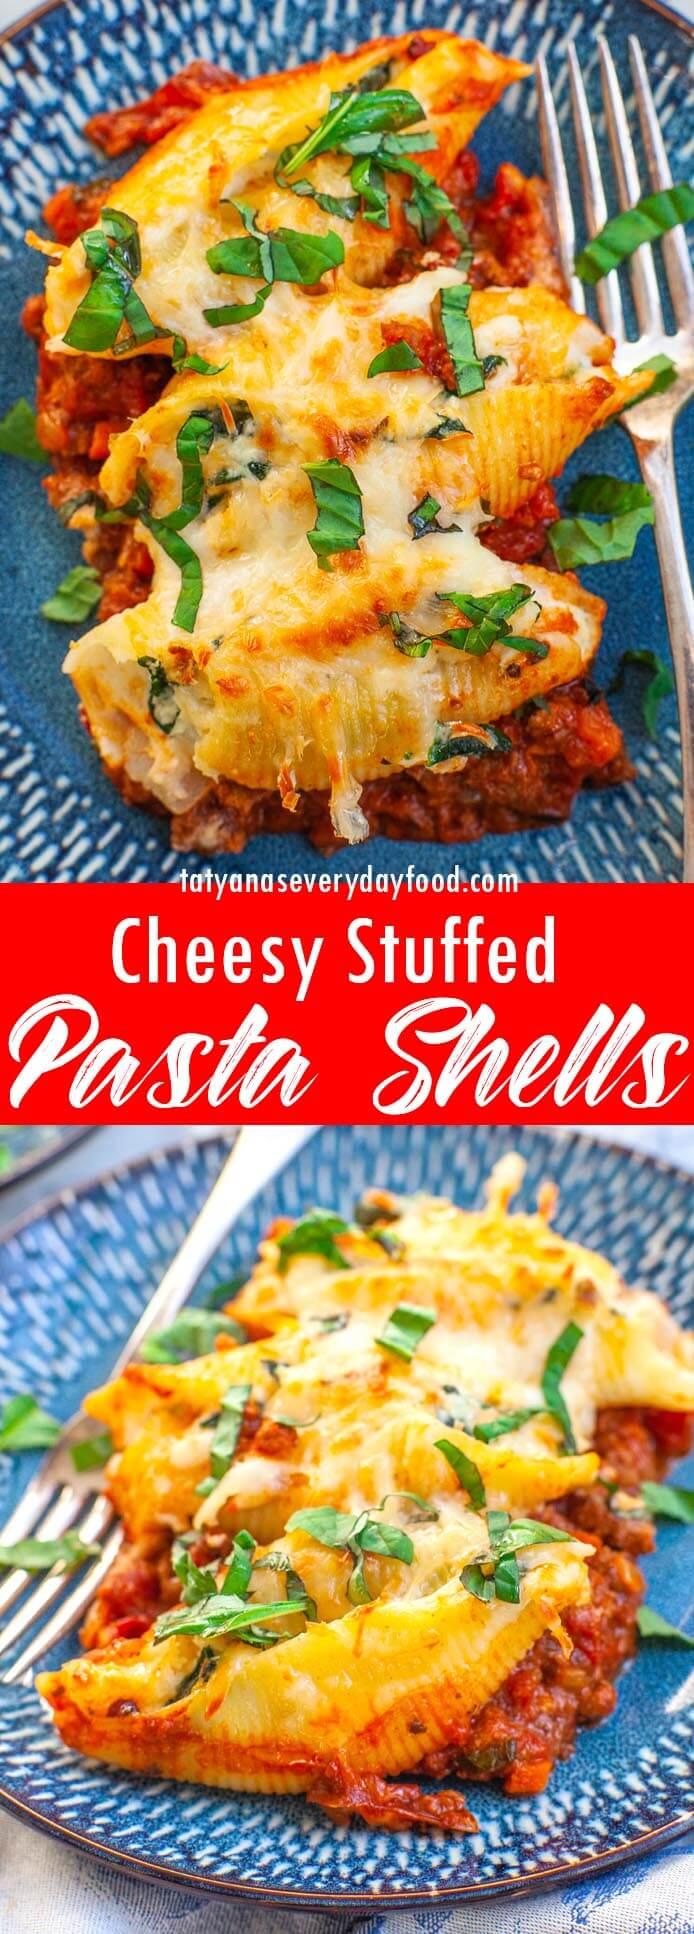 Cheesy Stuffed Pasta Shells video recipe